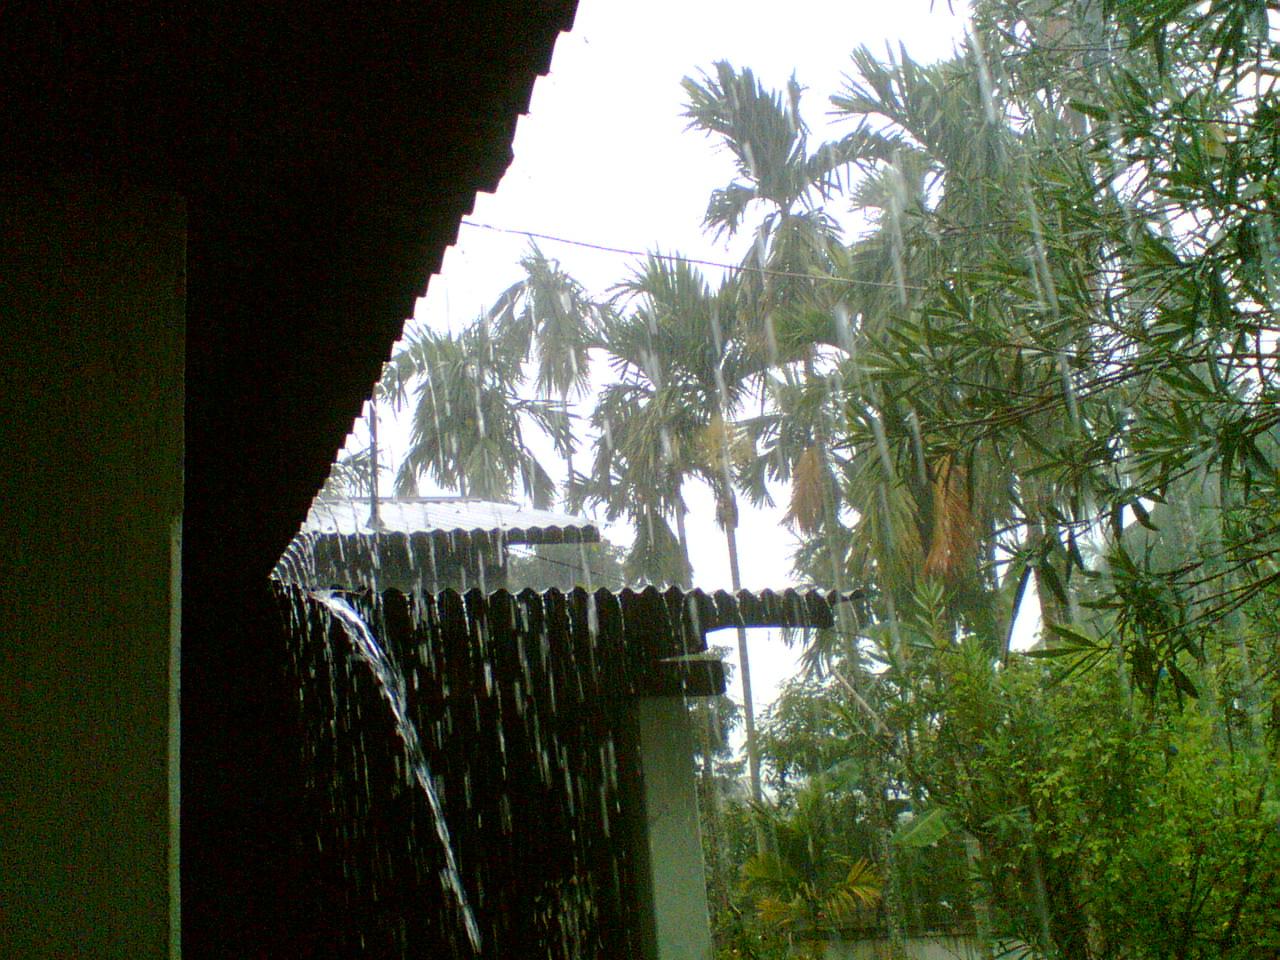 rainwater in my house